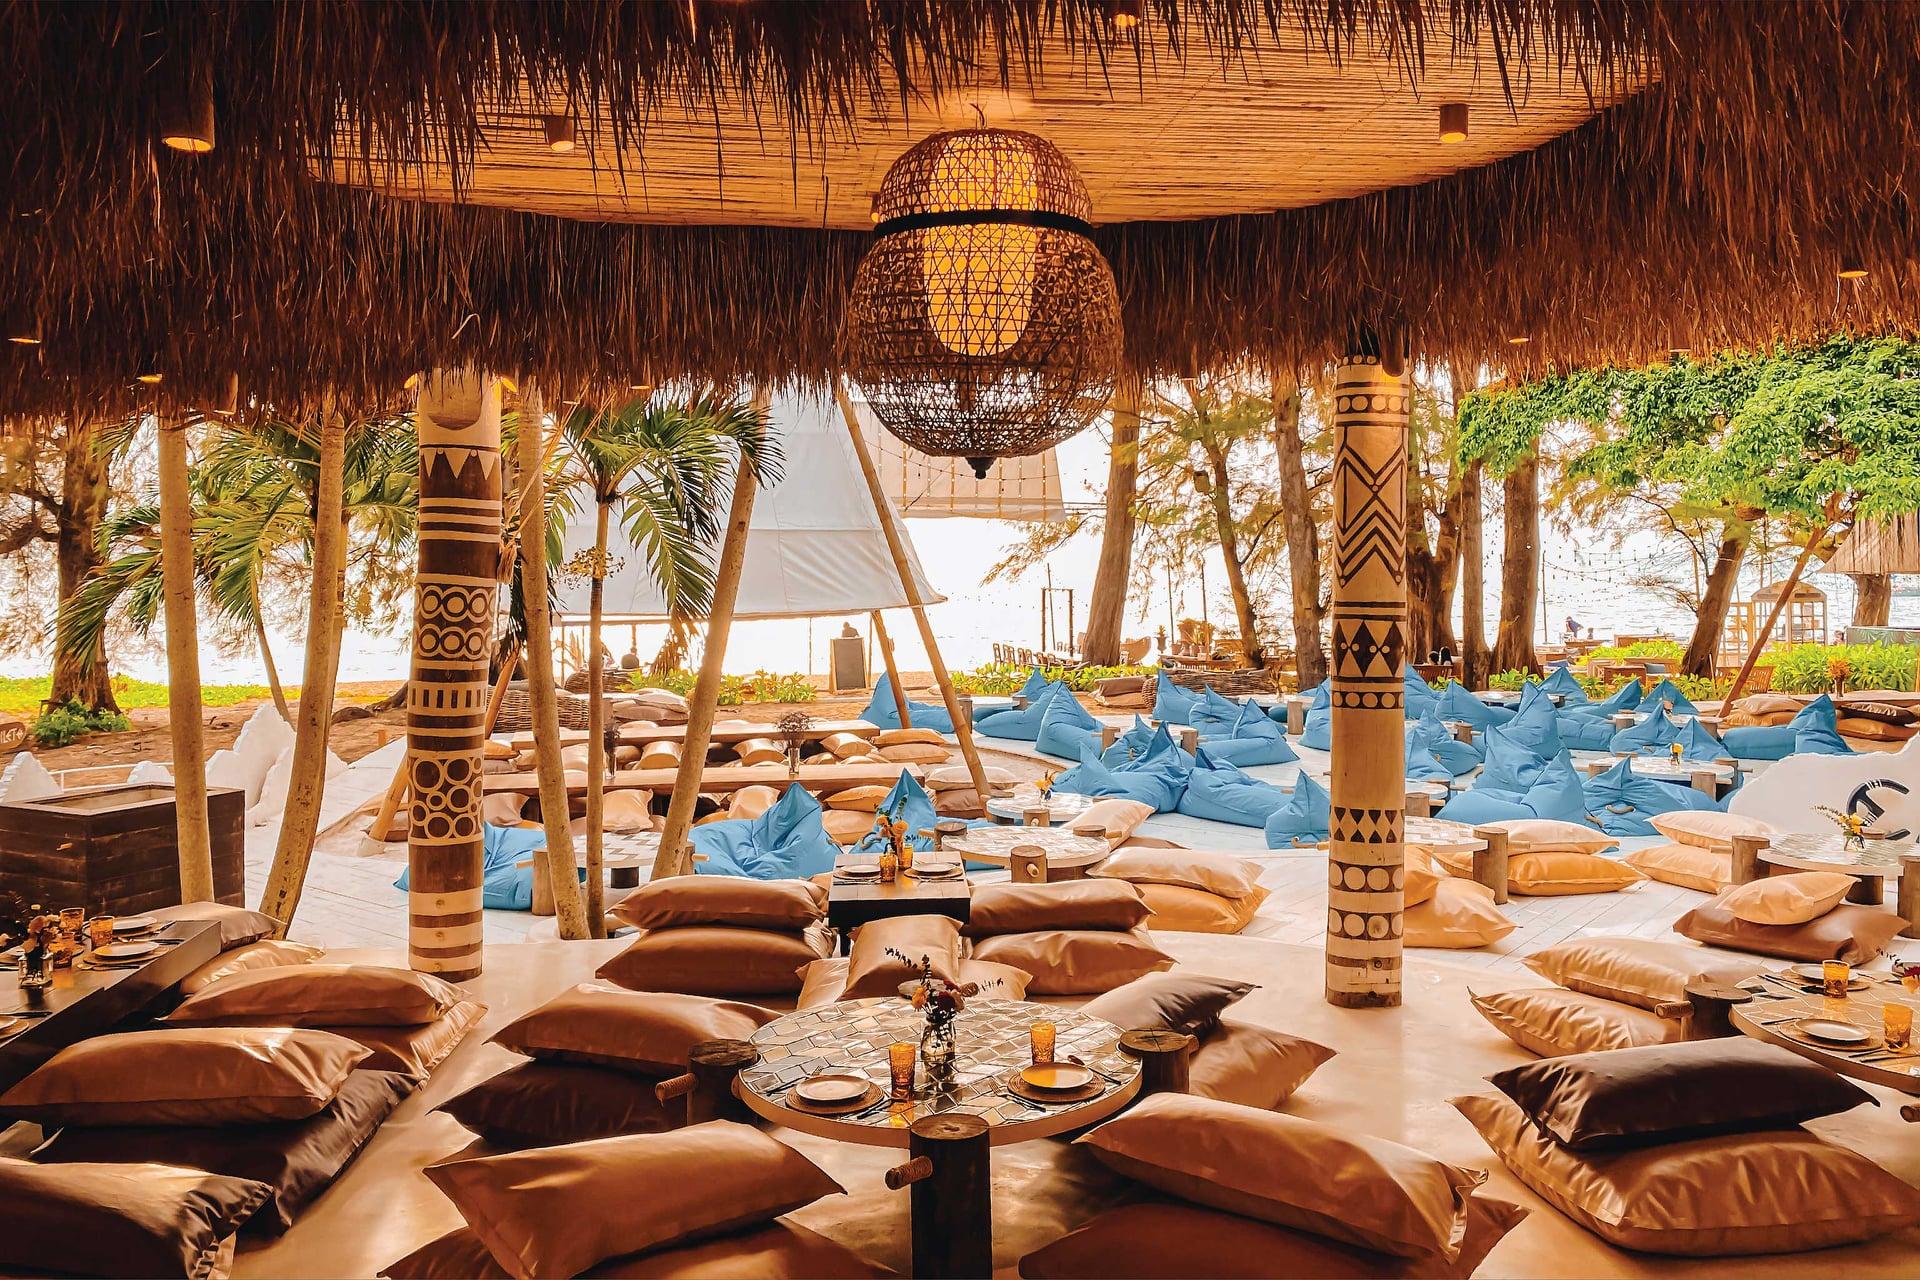 Rustic, Boho, Stylish & Chic… Cave Beach Club & Restaurant | REm Magazine